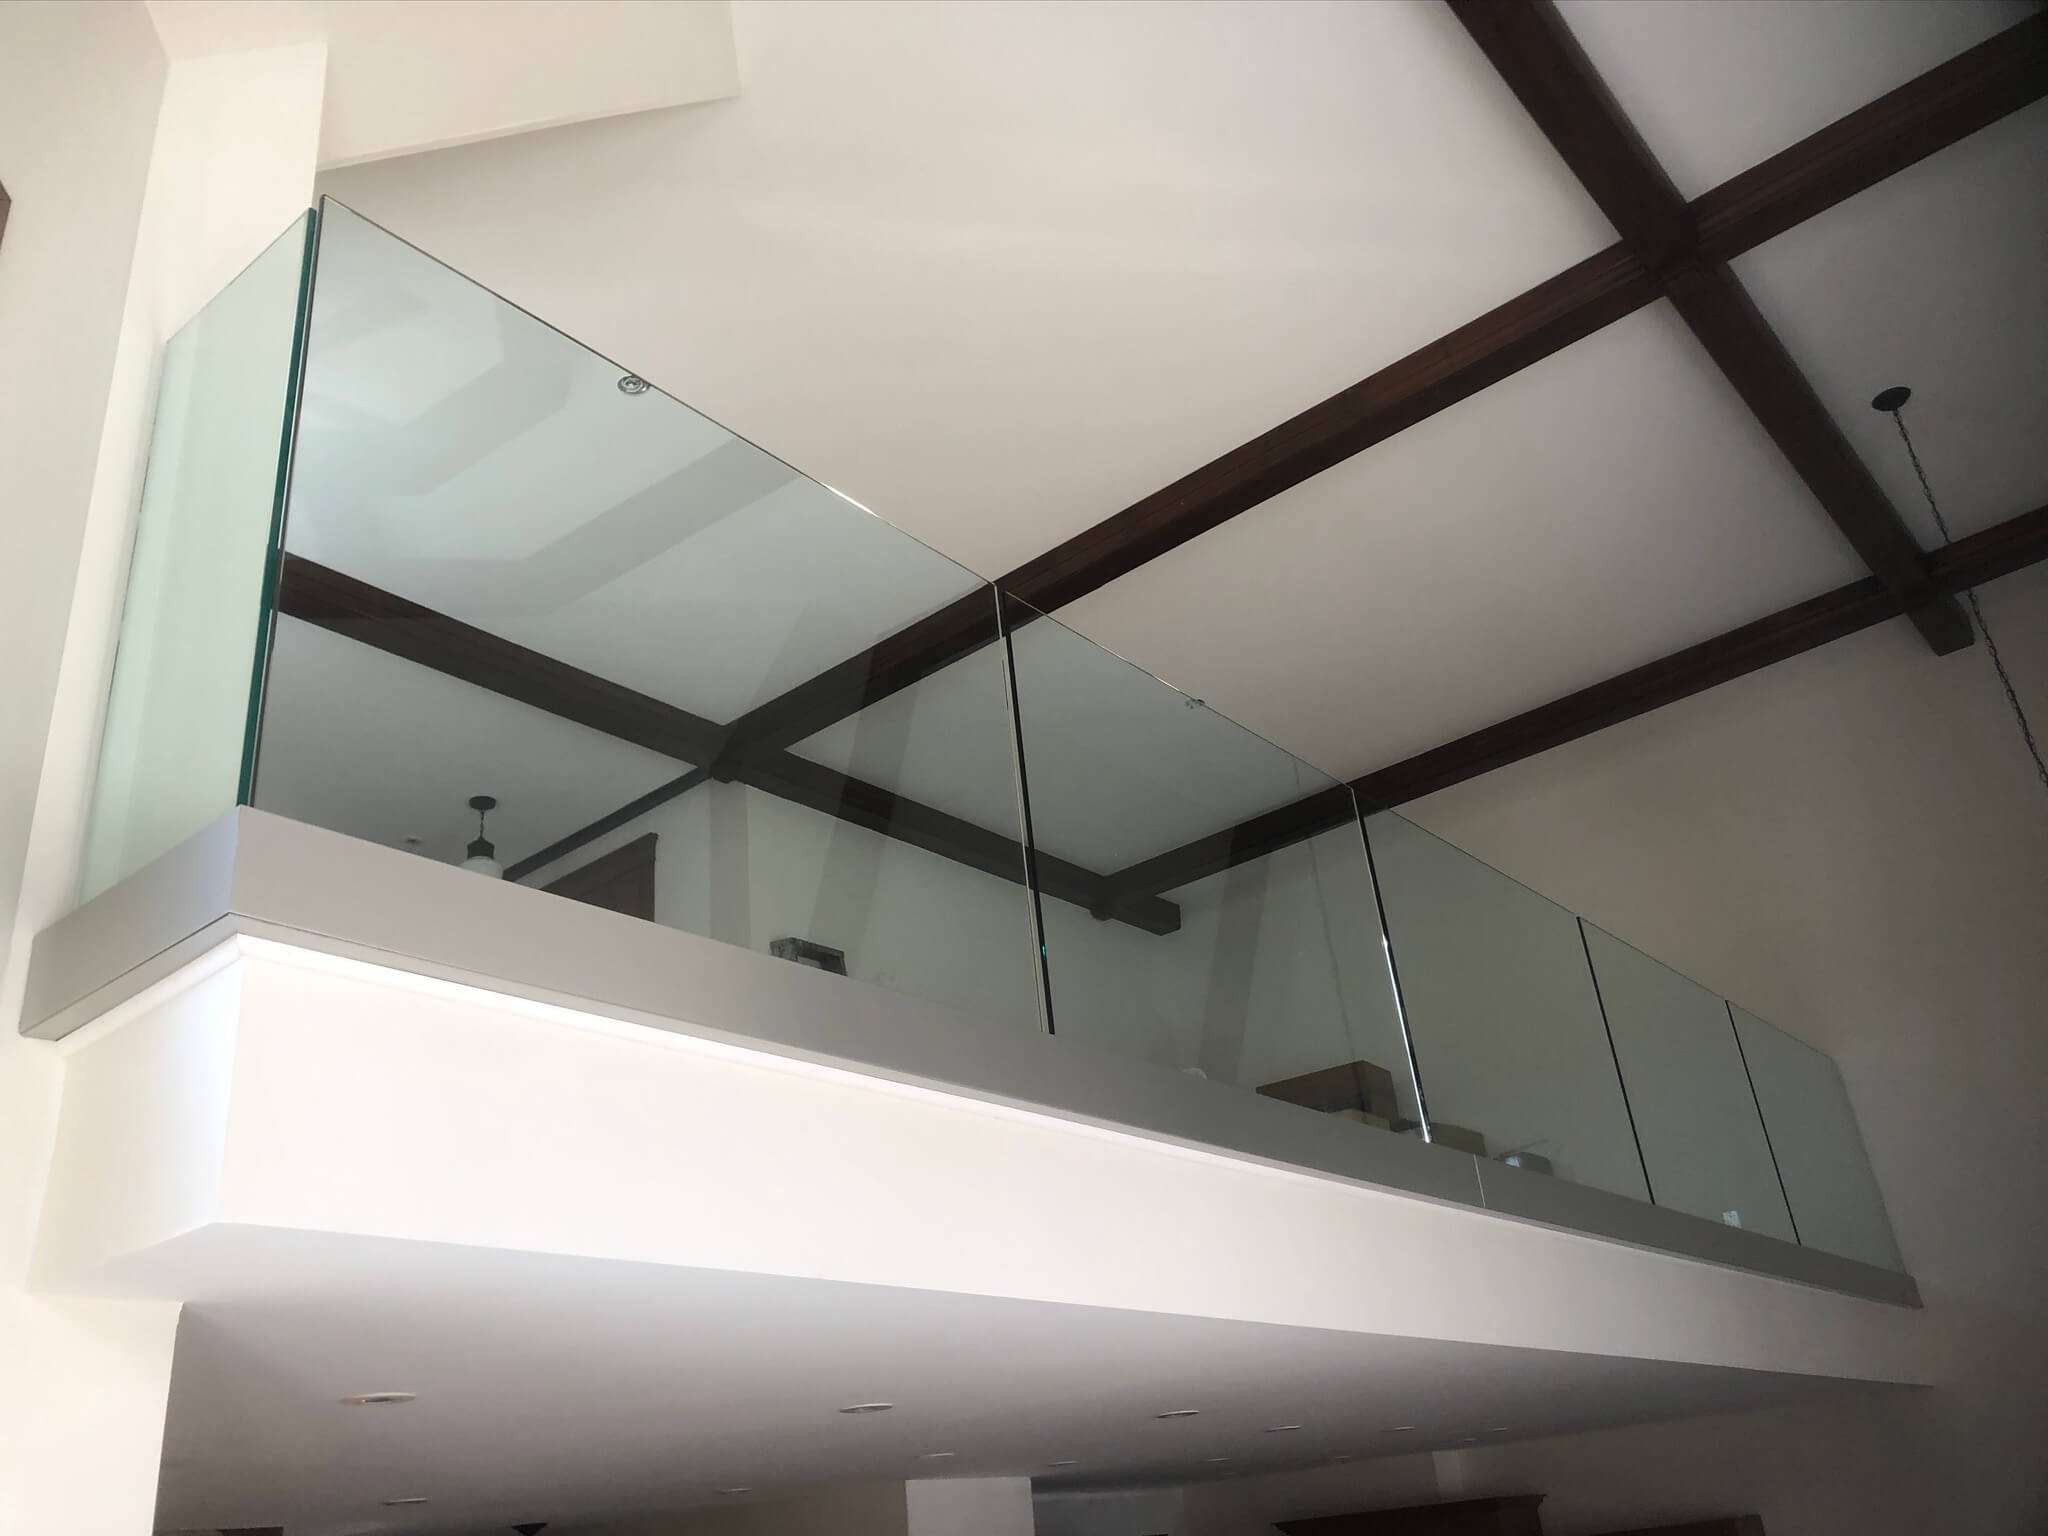 interior mezzanine glass railing 03